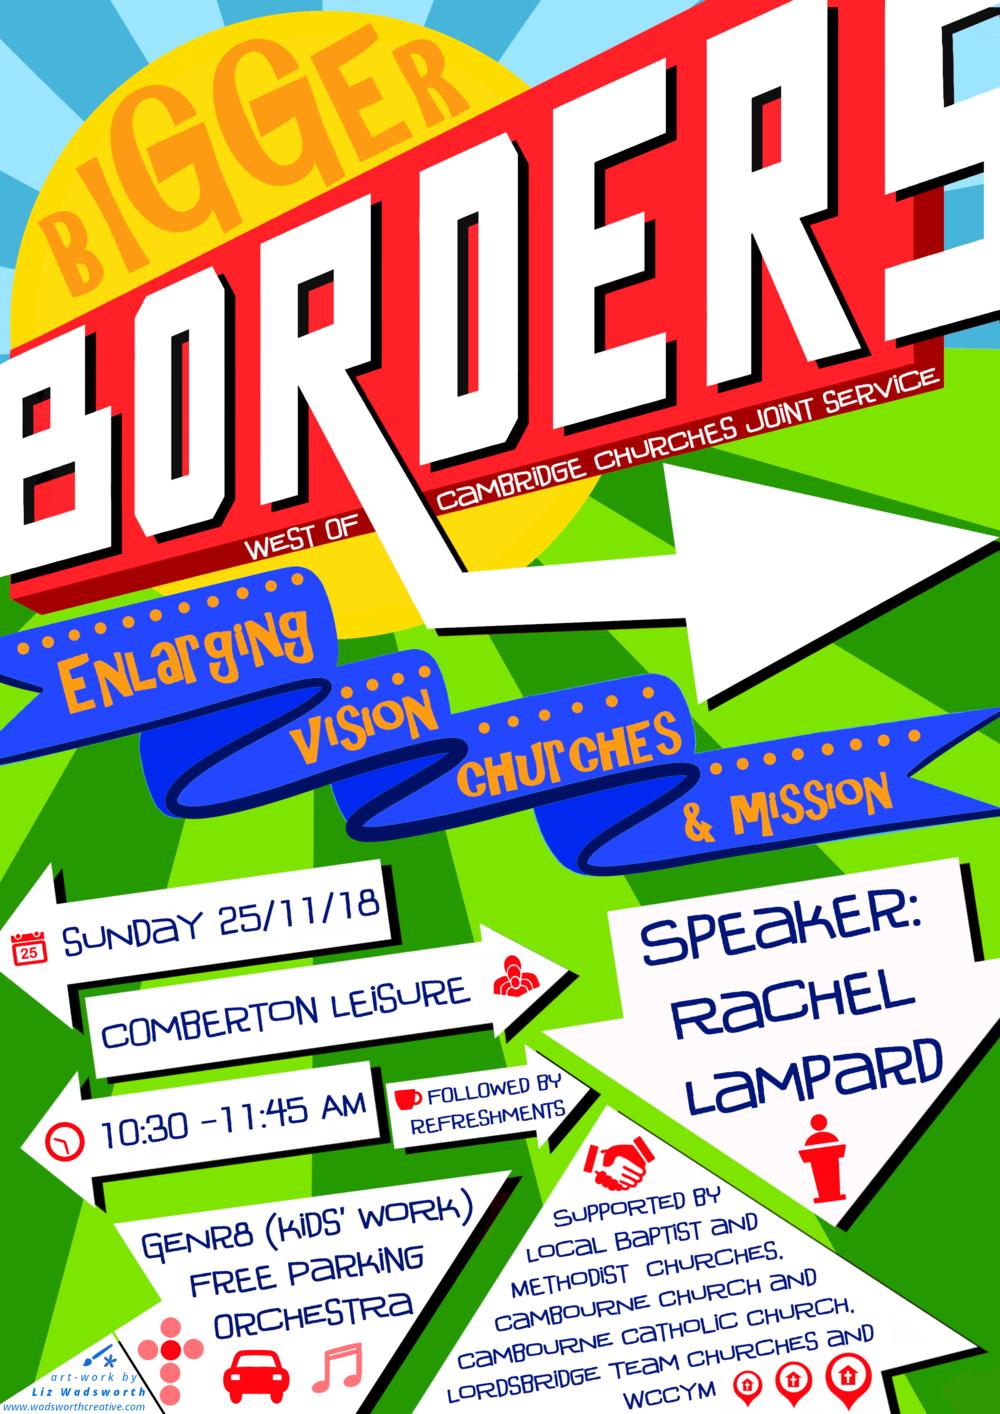 Bigger Borders